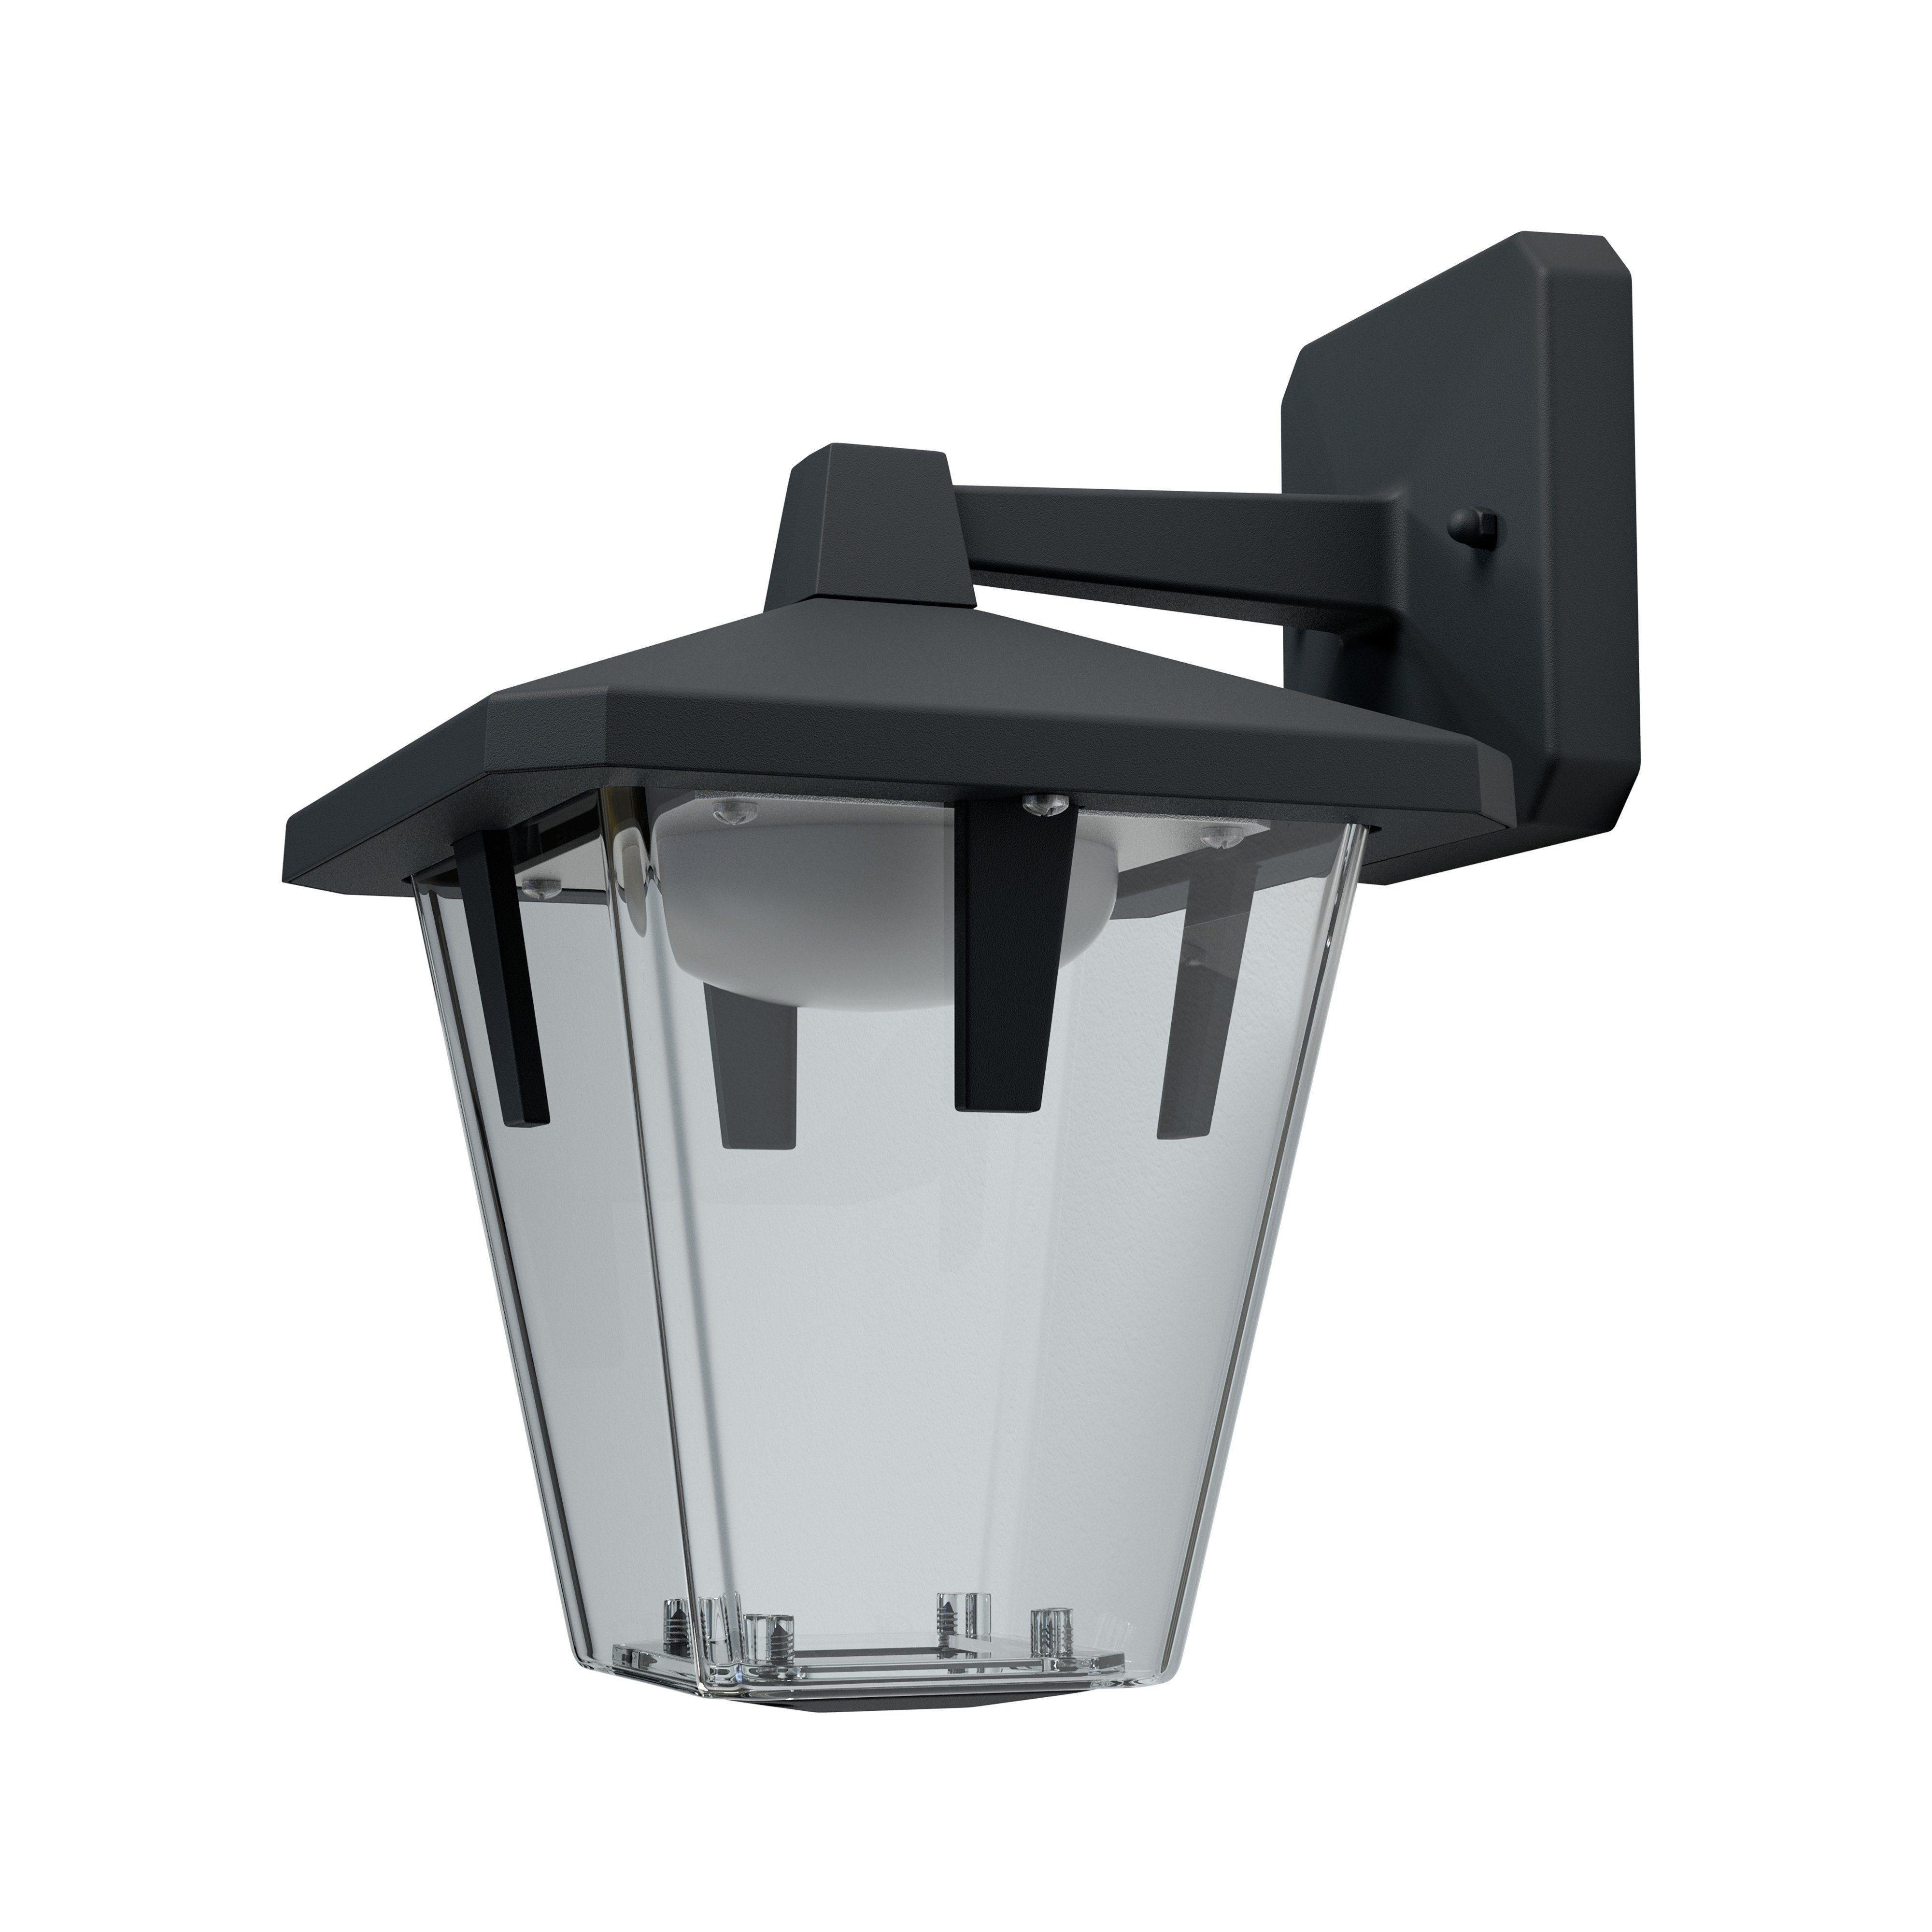 LED-Wandleuchte, Laterne, Außenbereich »ENDURA STYLE Lantern Classic Down 10 W BK«